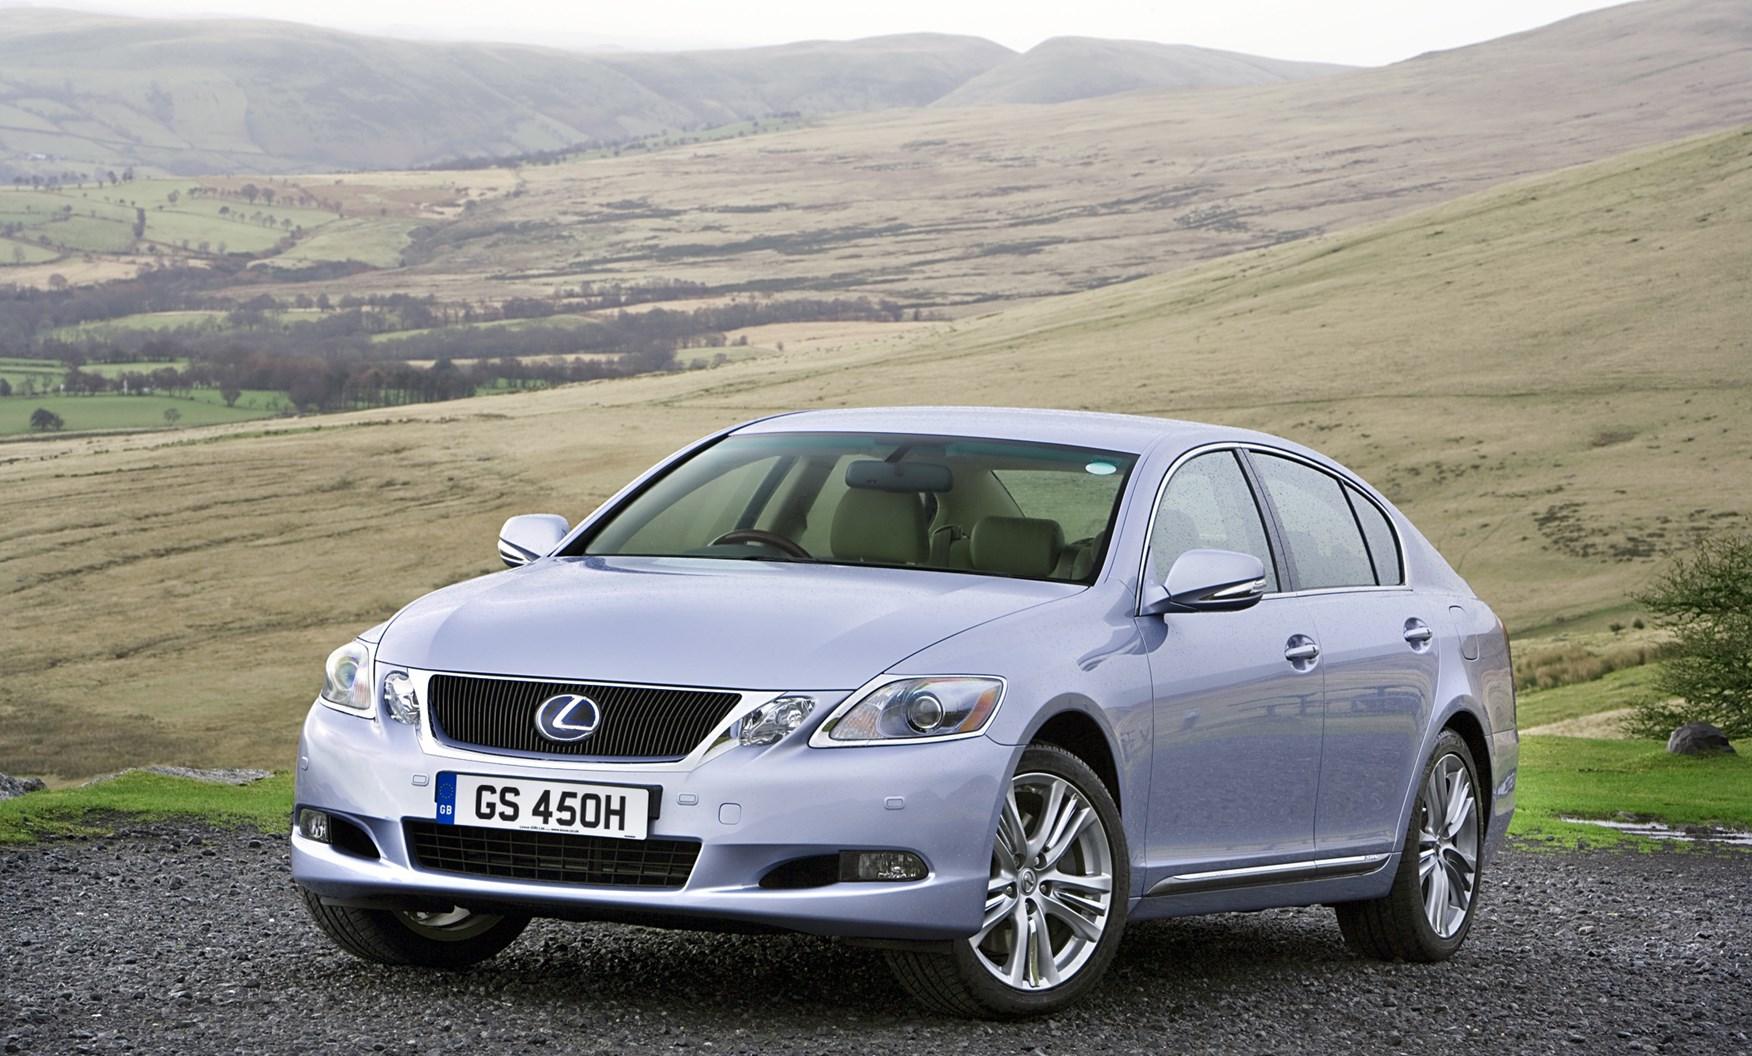 2009 lexus gs 450h hybrid mpg